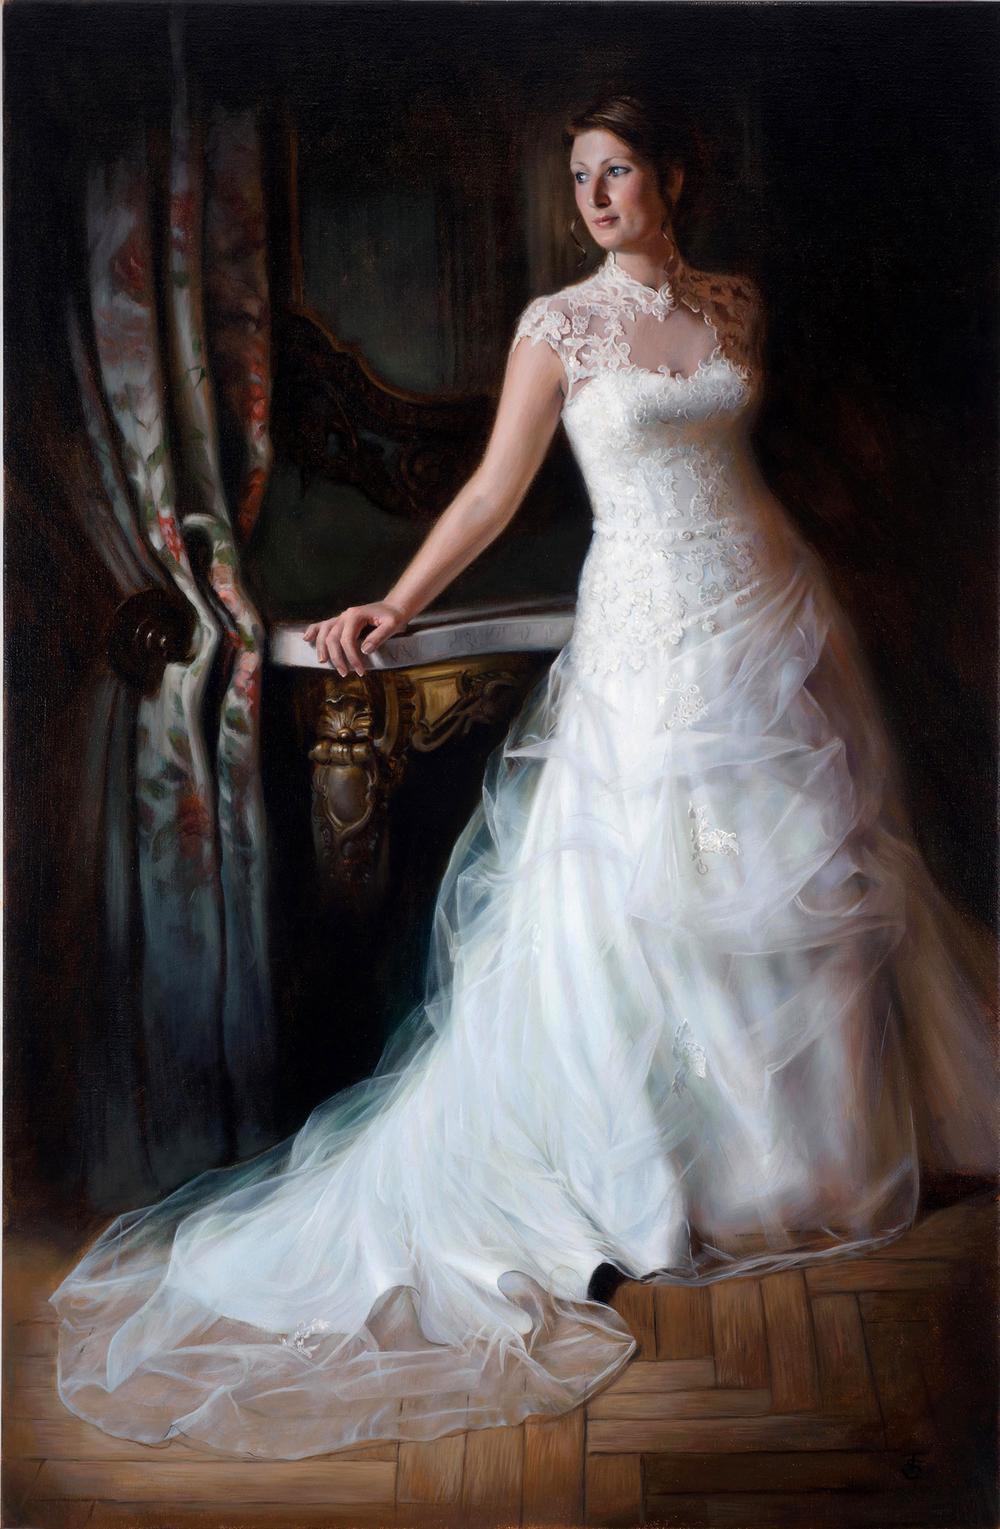 Oil painting by Tina Spratt